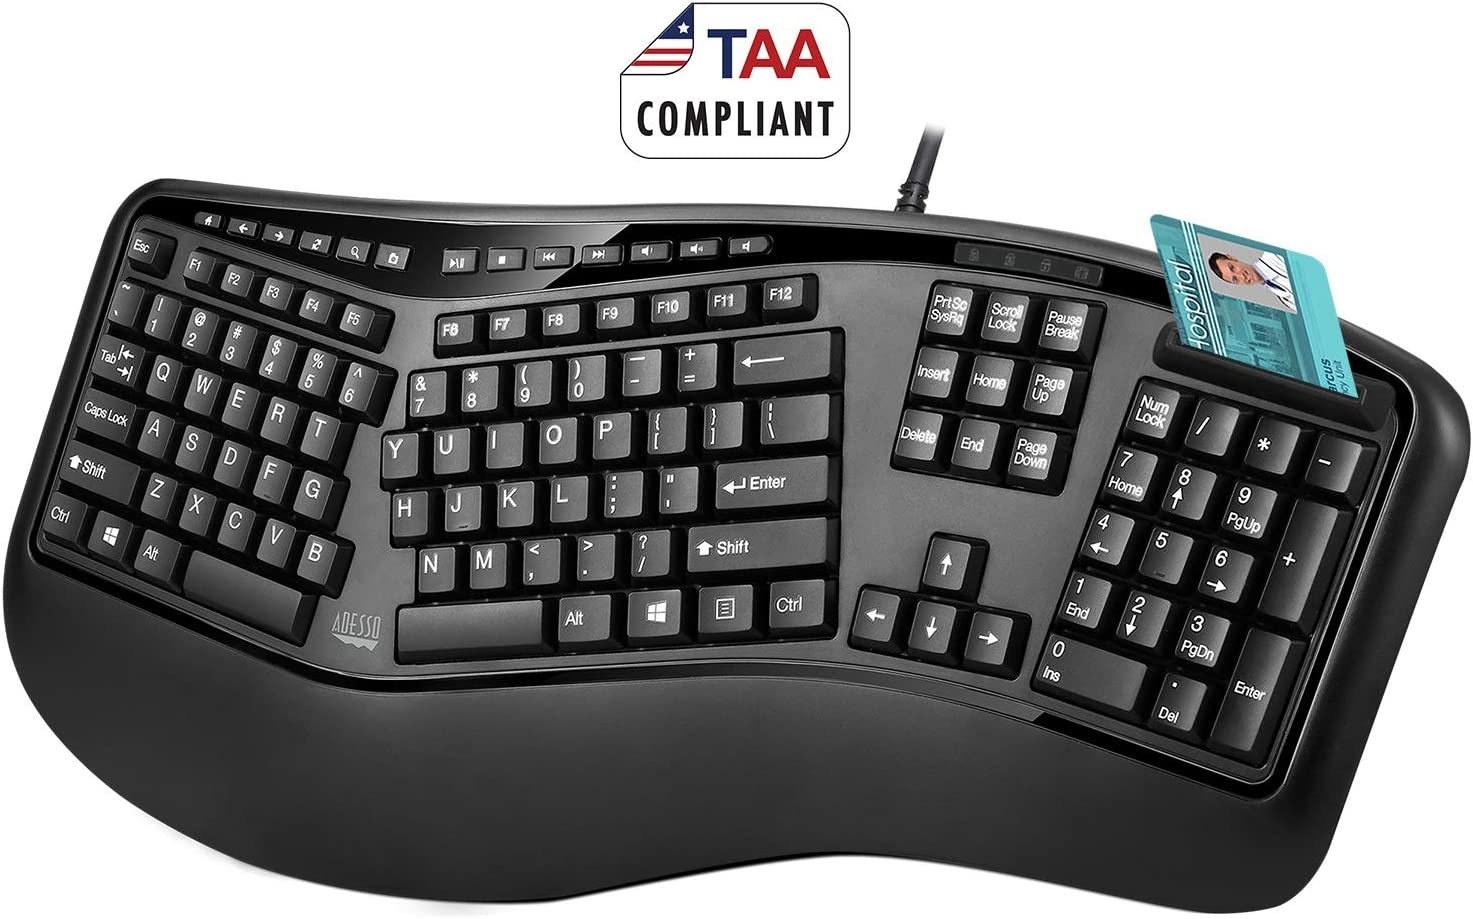 Adesso TruForm AKB-150SB-TAA Desktop Ergonomic Smart Card Reader Keyboard (TAA Compliant)